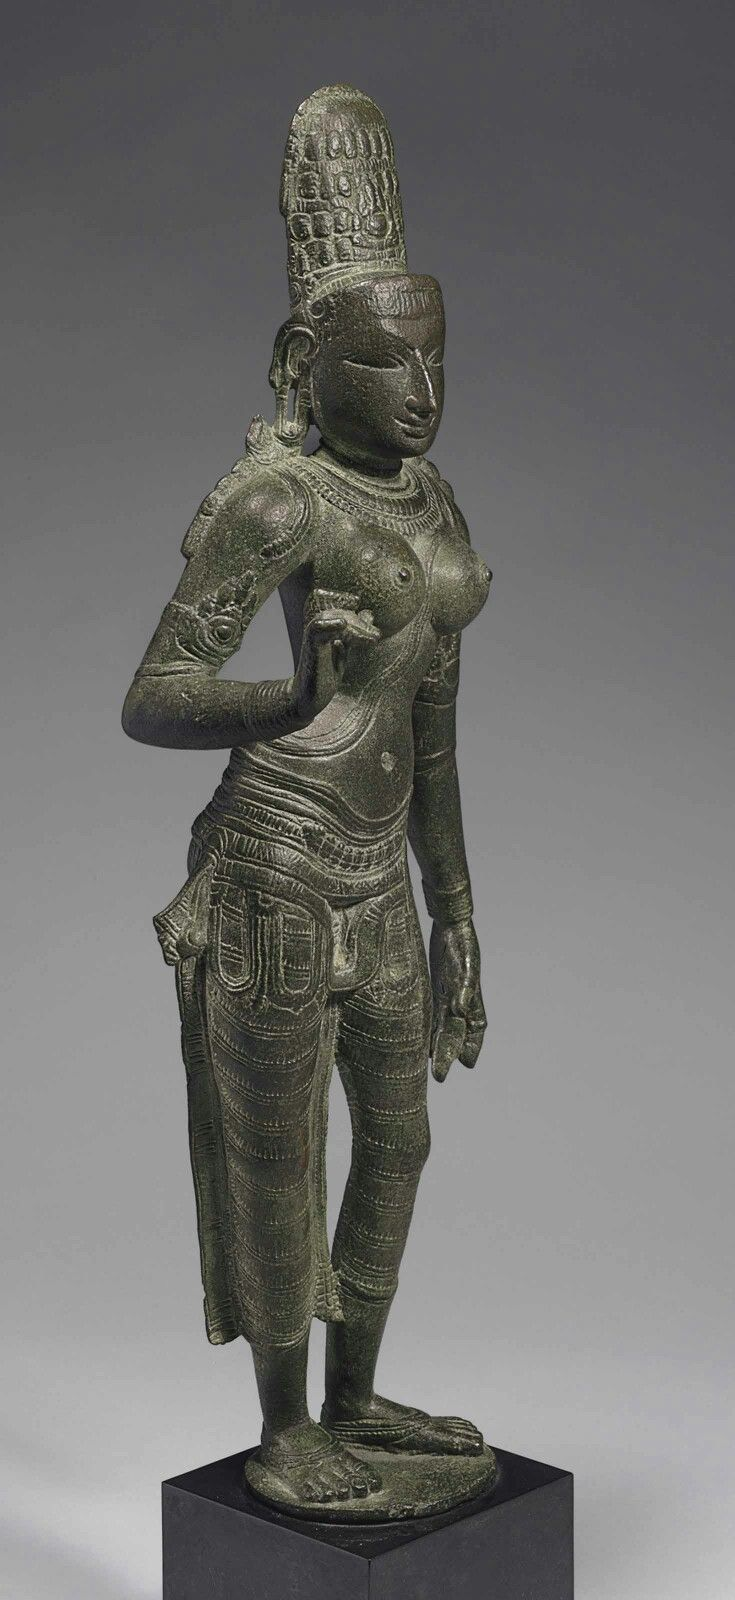 A BRONZE FIGURE OF PARVATI SOUTH INDIA, CHOLA DYNASTY, CIRCA 1200.